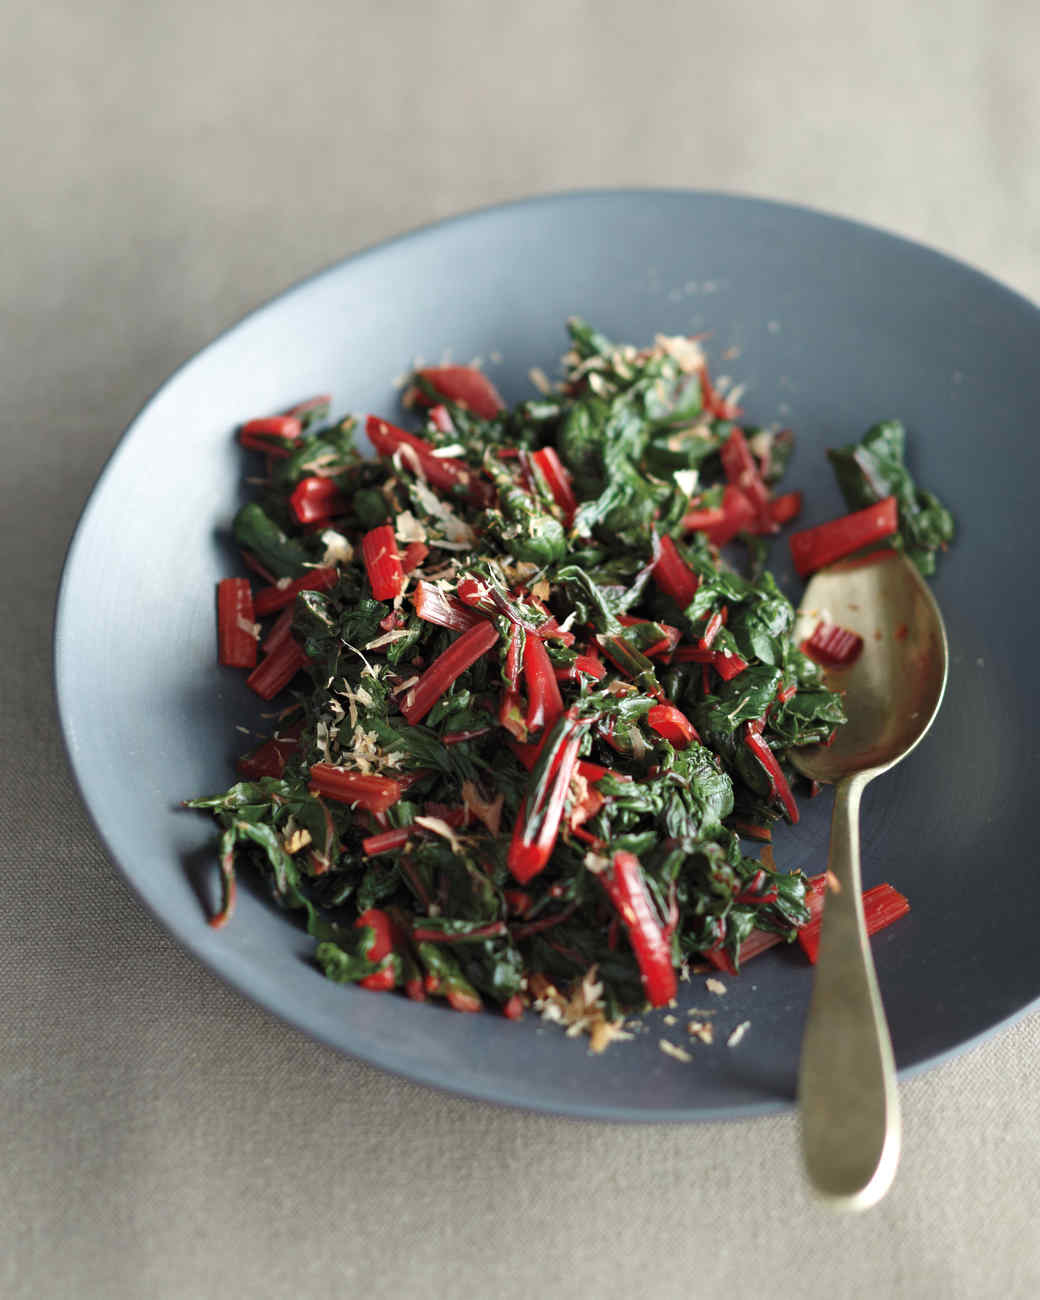 chard-salad-002-mld109712.jpg